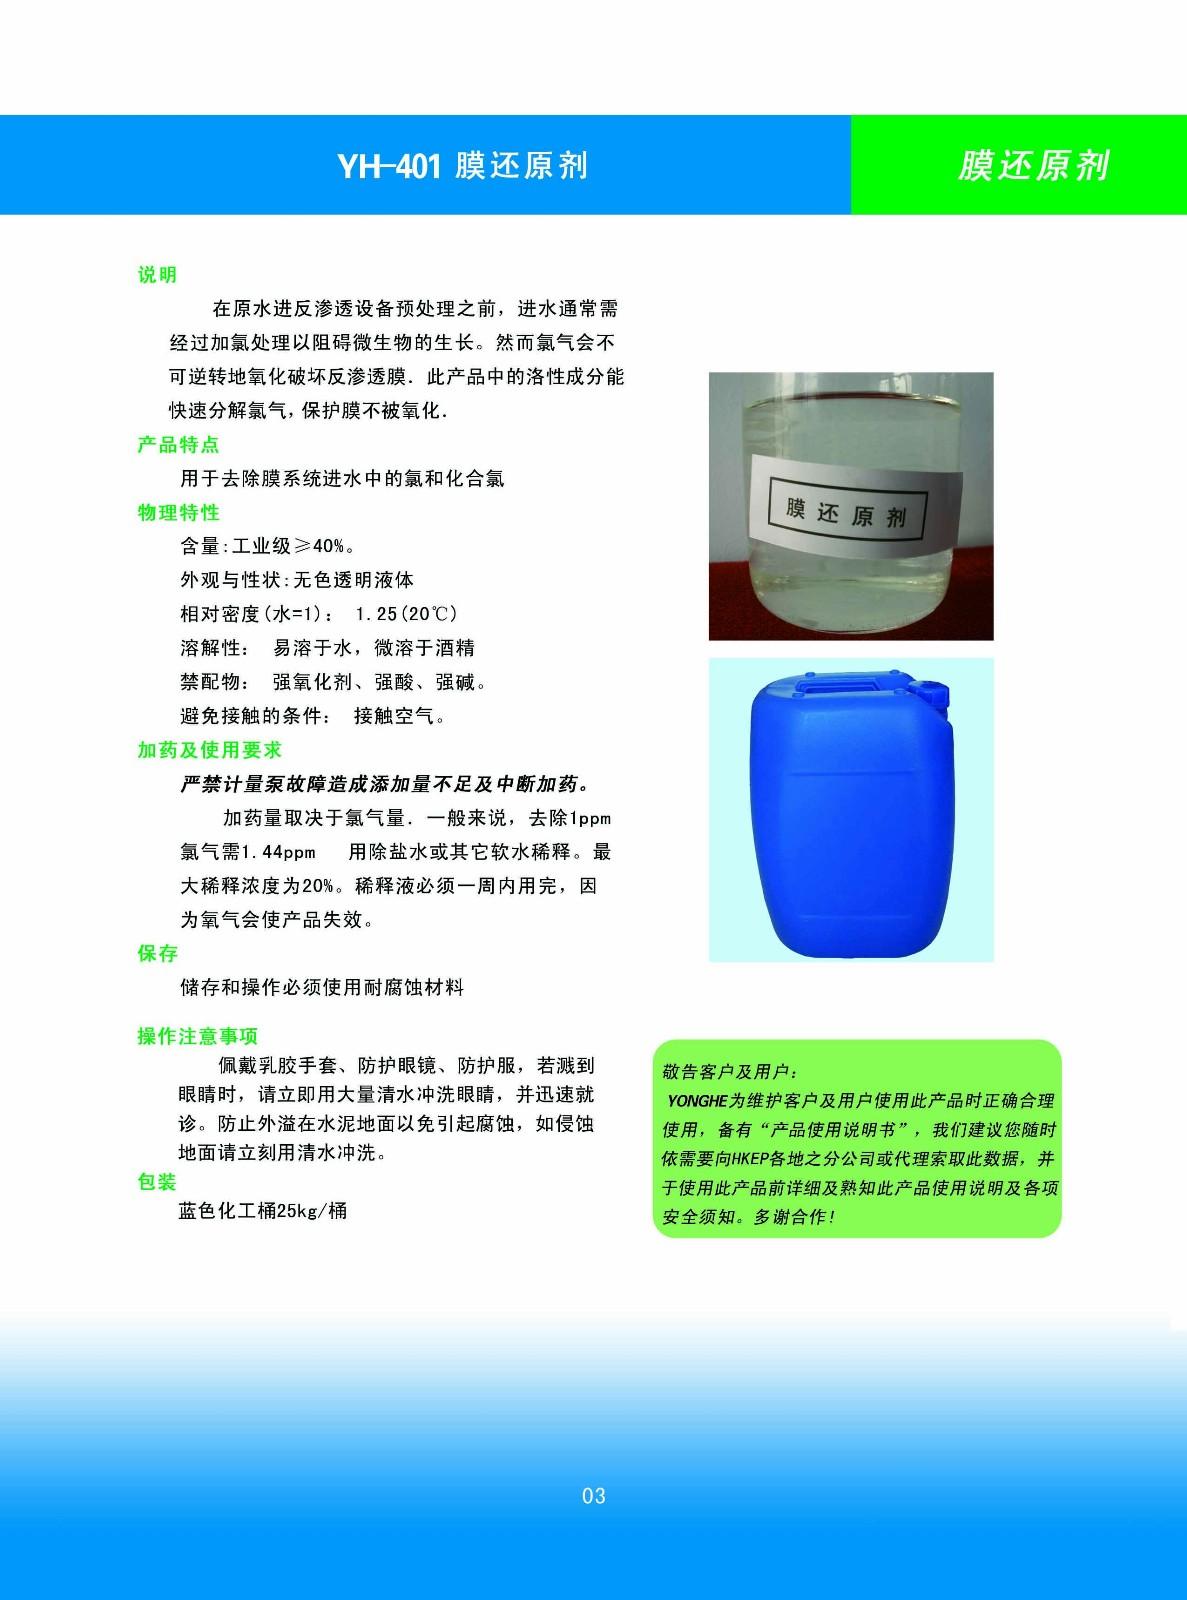 03 YH-401 膜還原劑.jpg